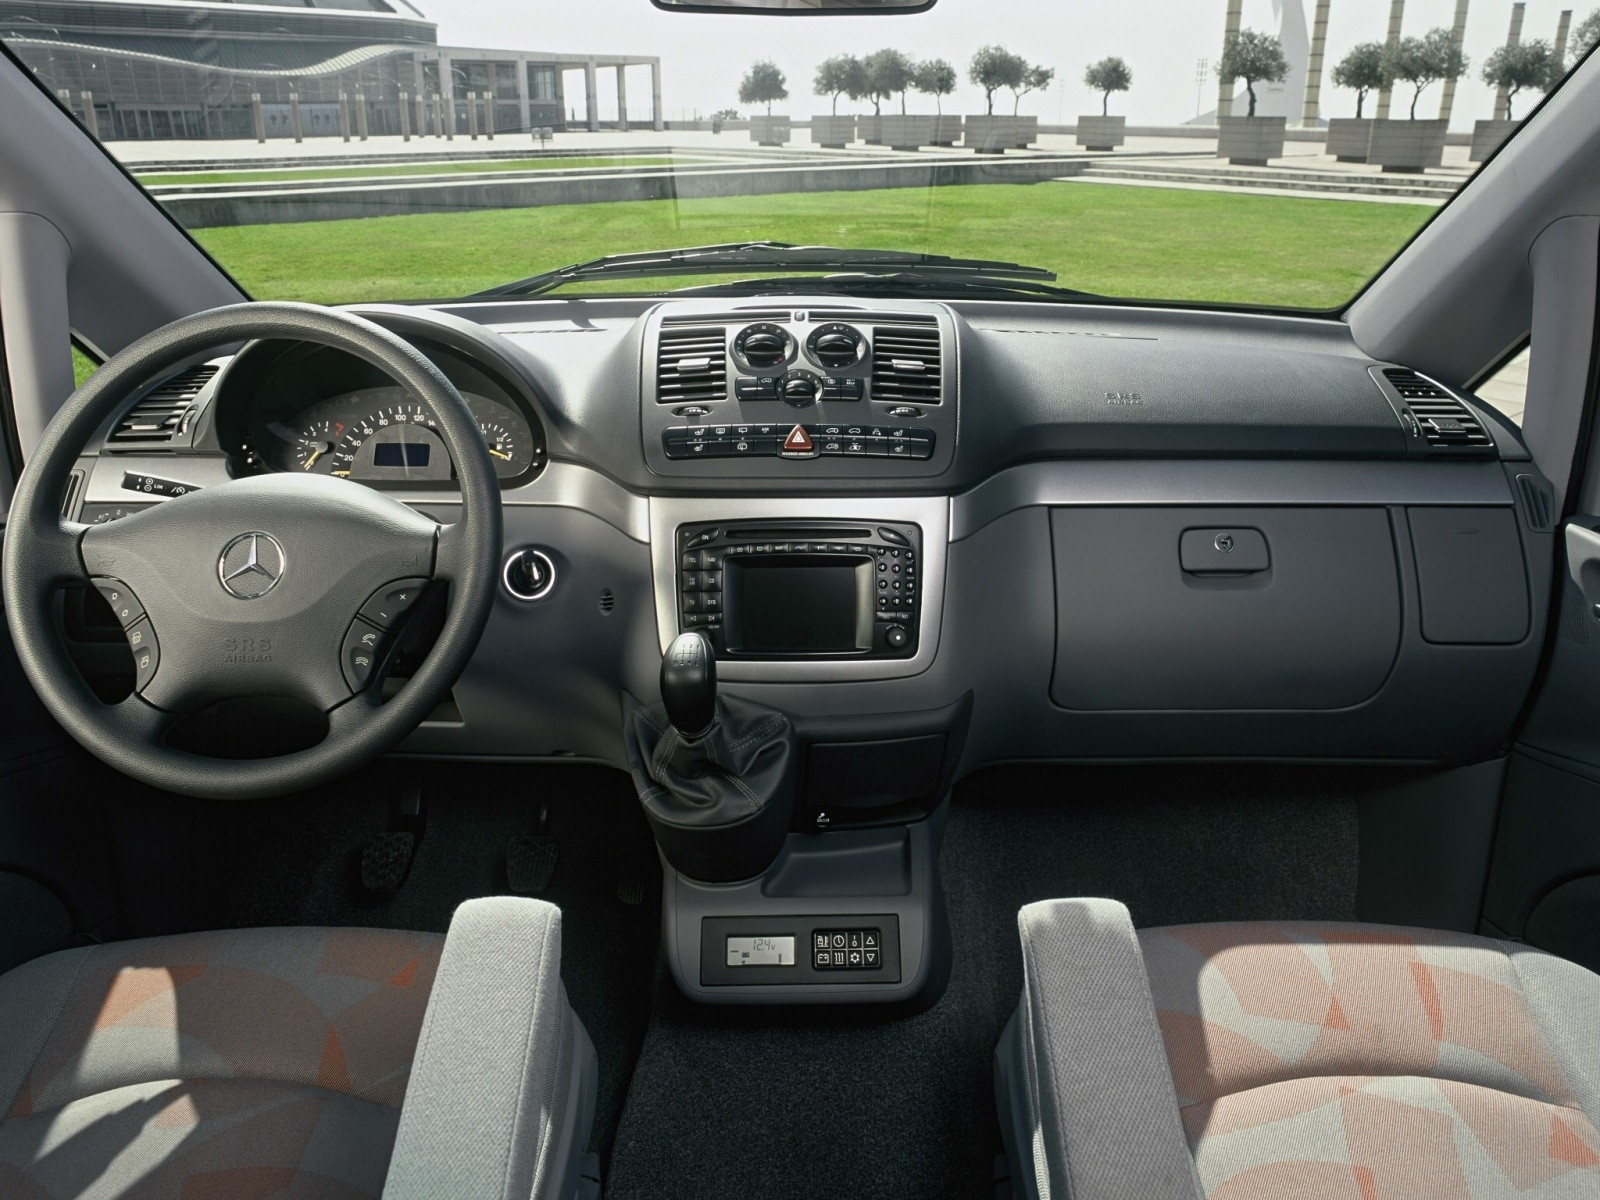 Mercedes benz viano specs 2010 2011 2012 2013 2014 for Cdi interior design